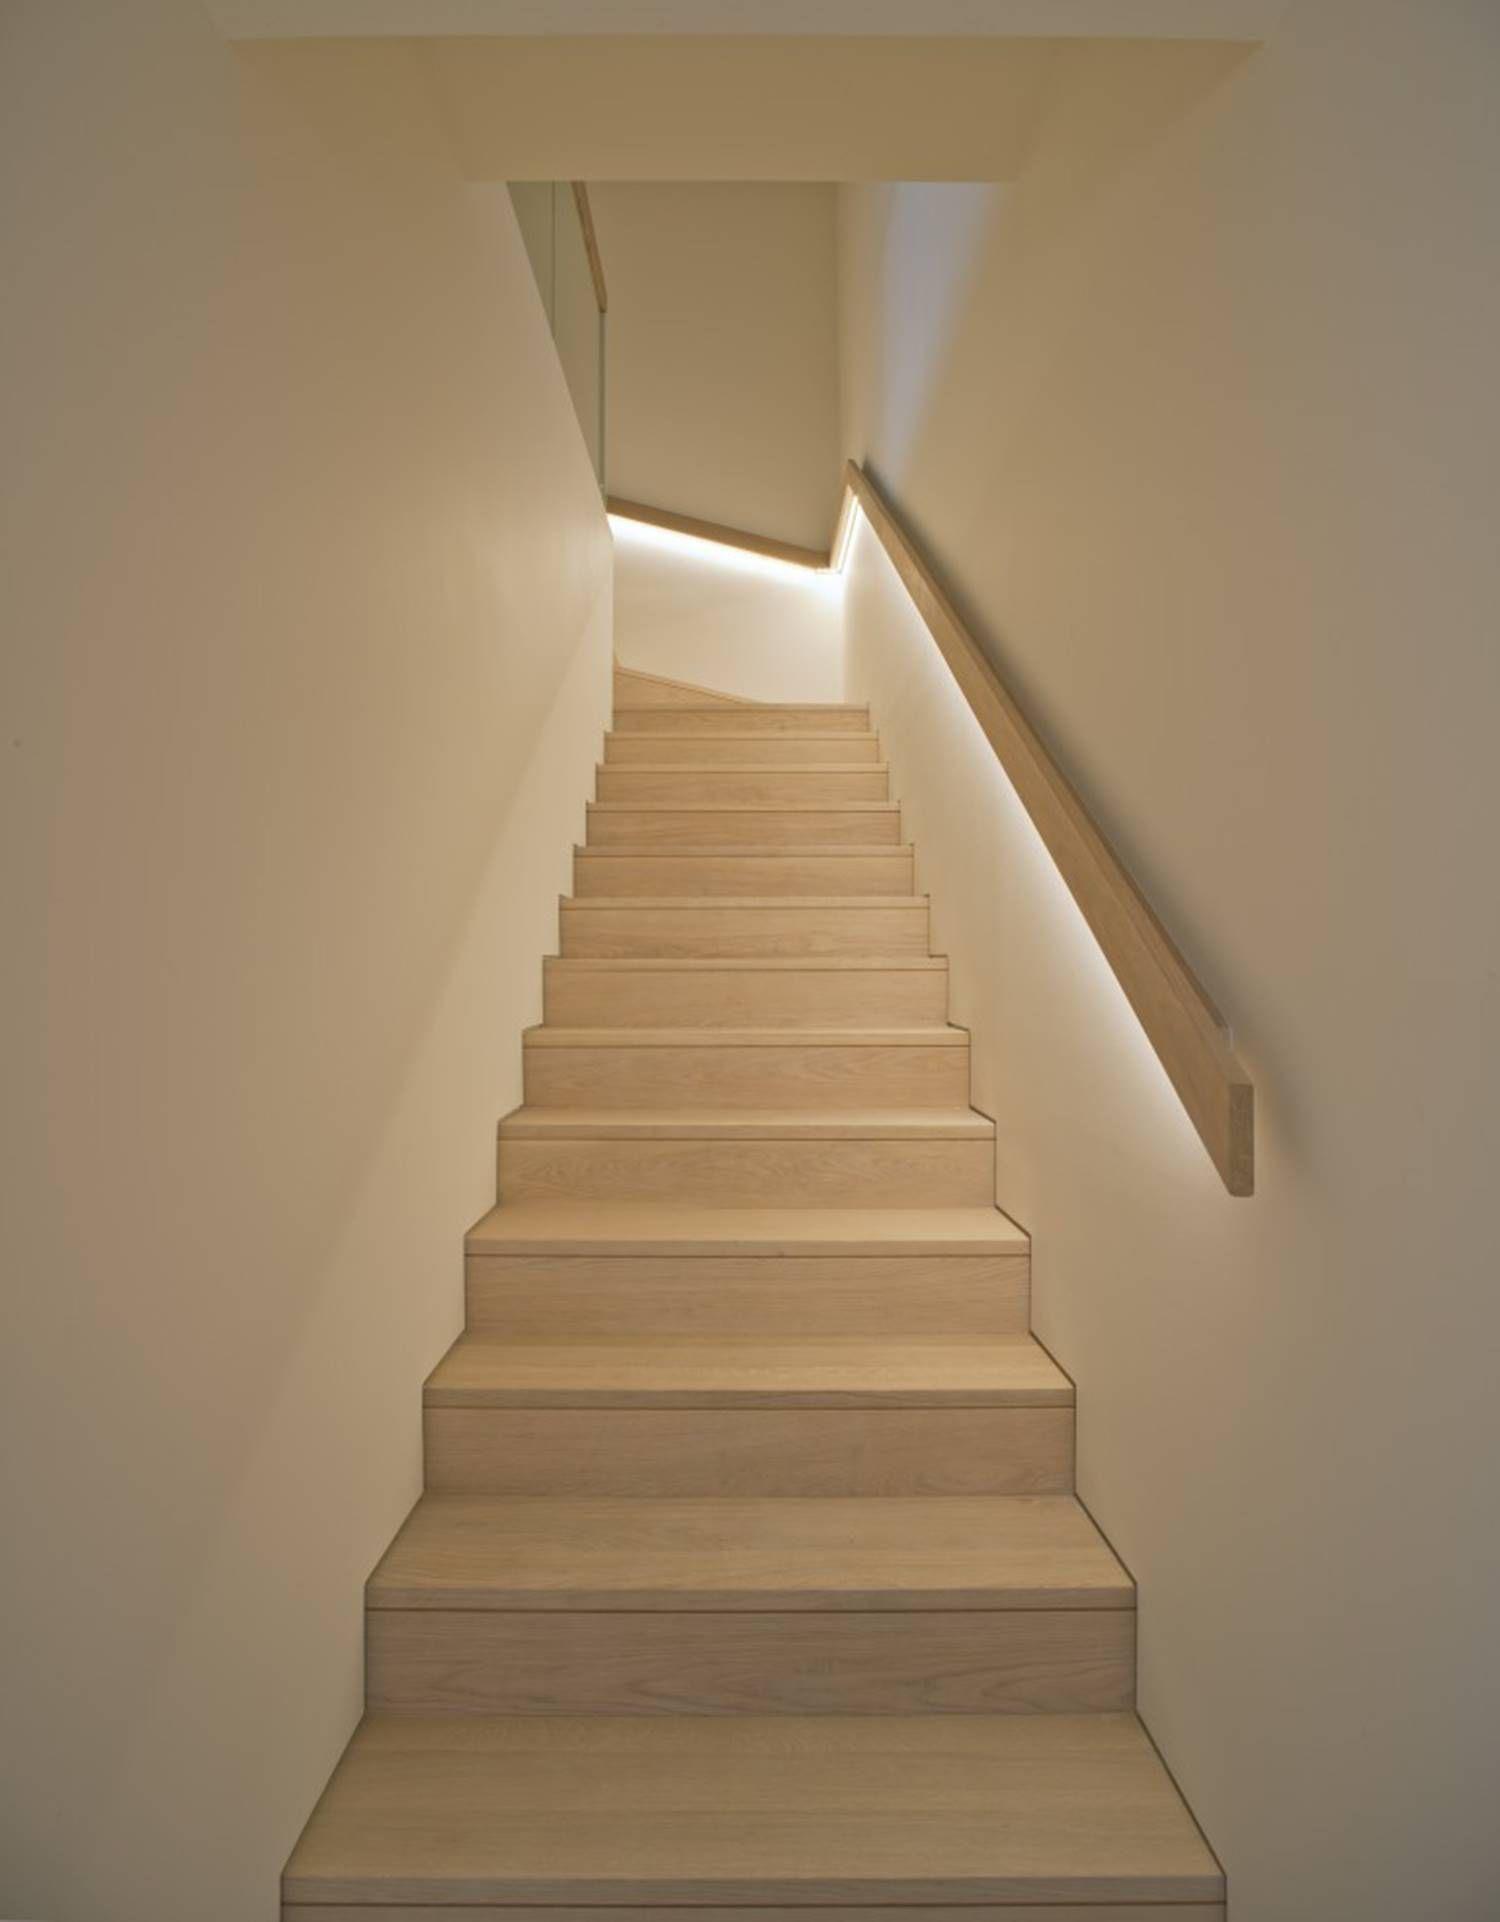 5 trucos para iluminar toda la casa sin errores #modernlightingdesign